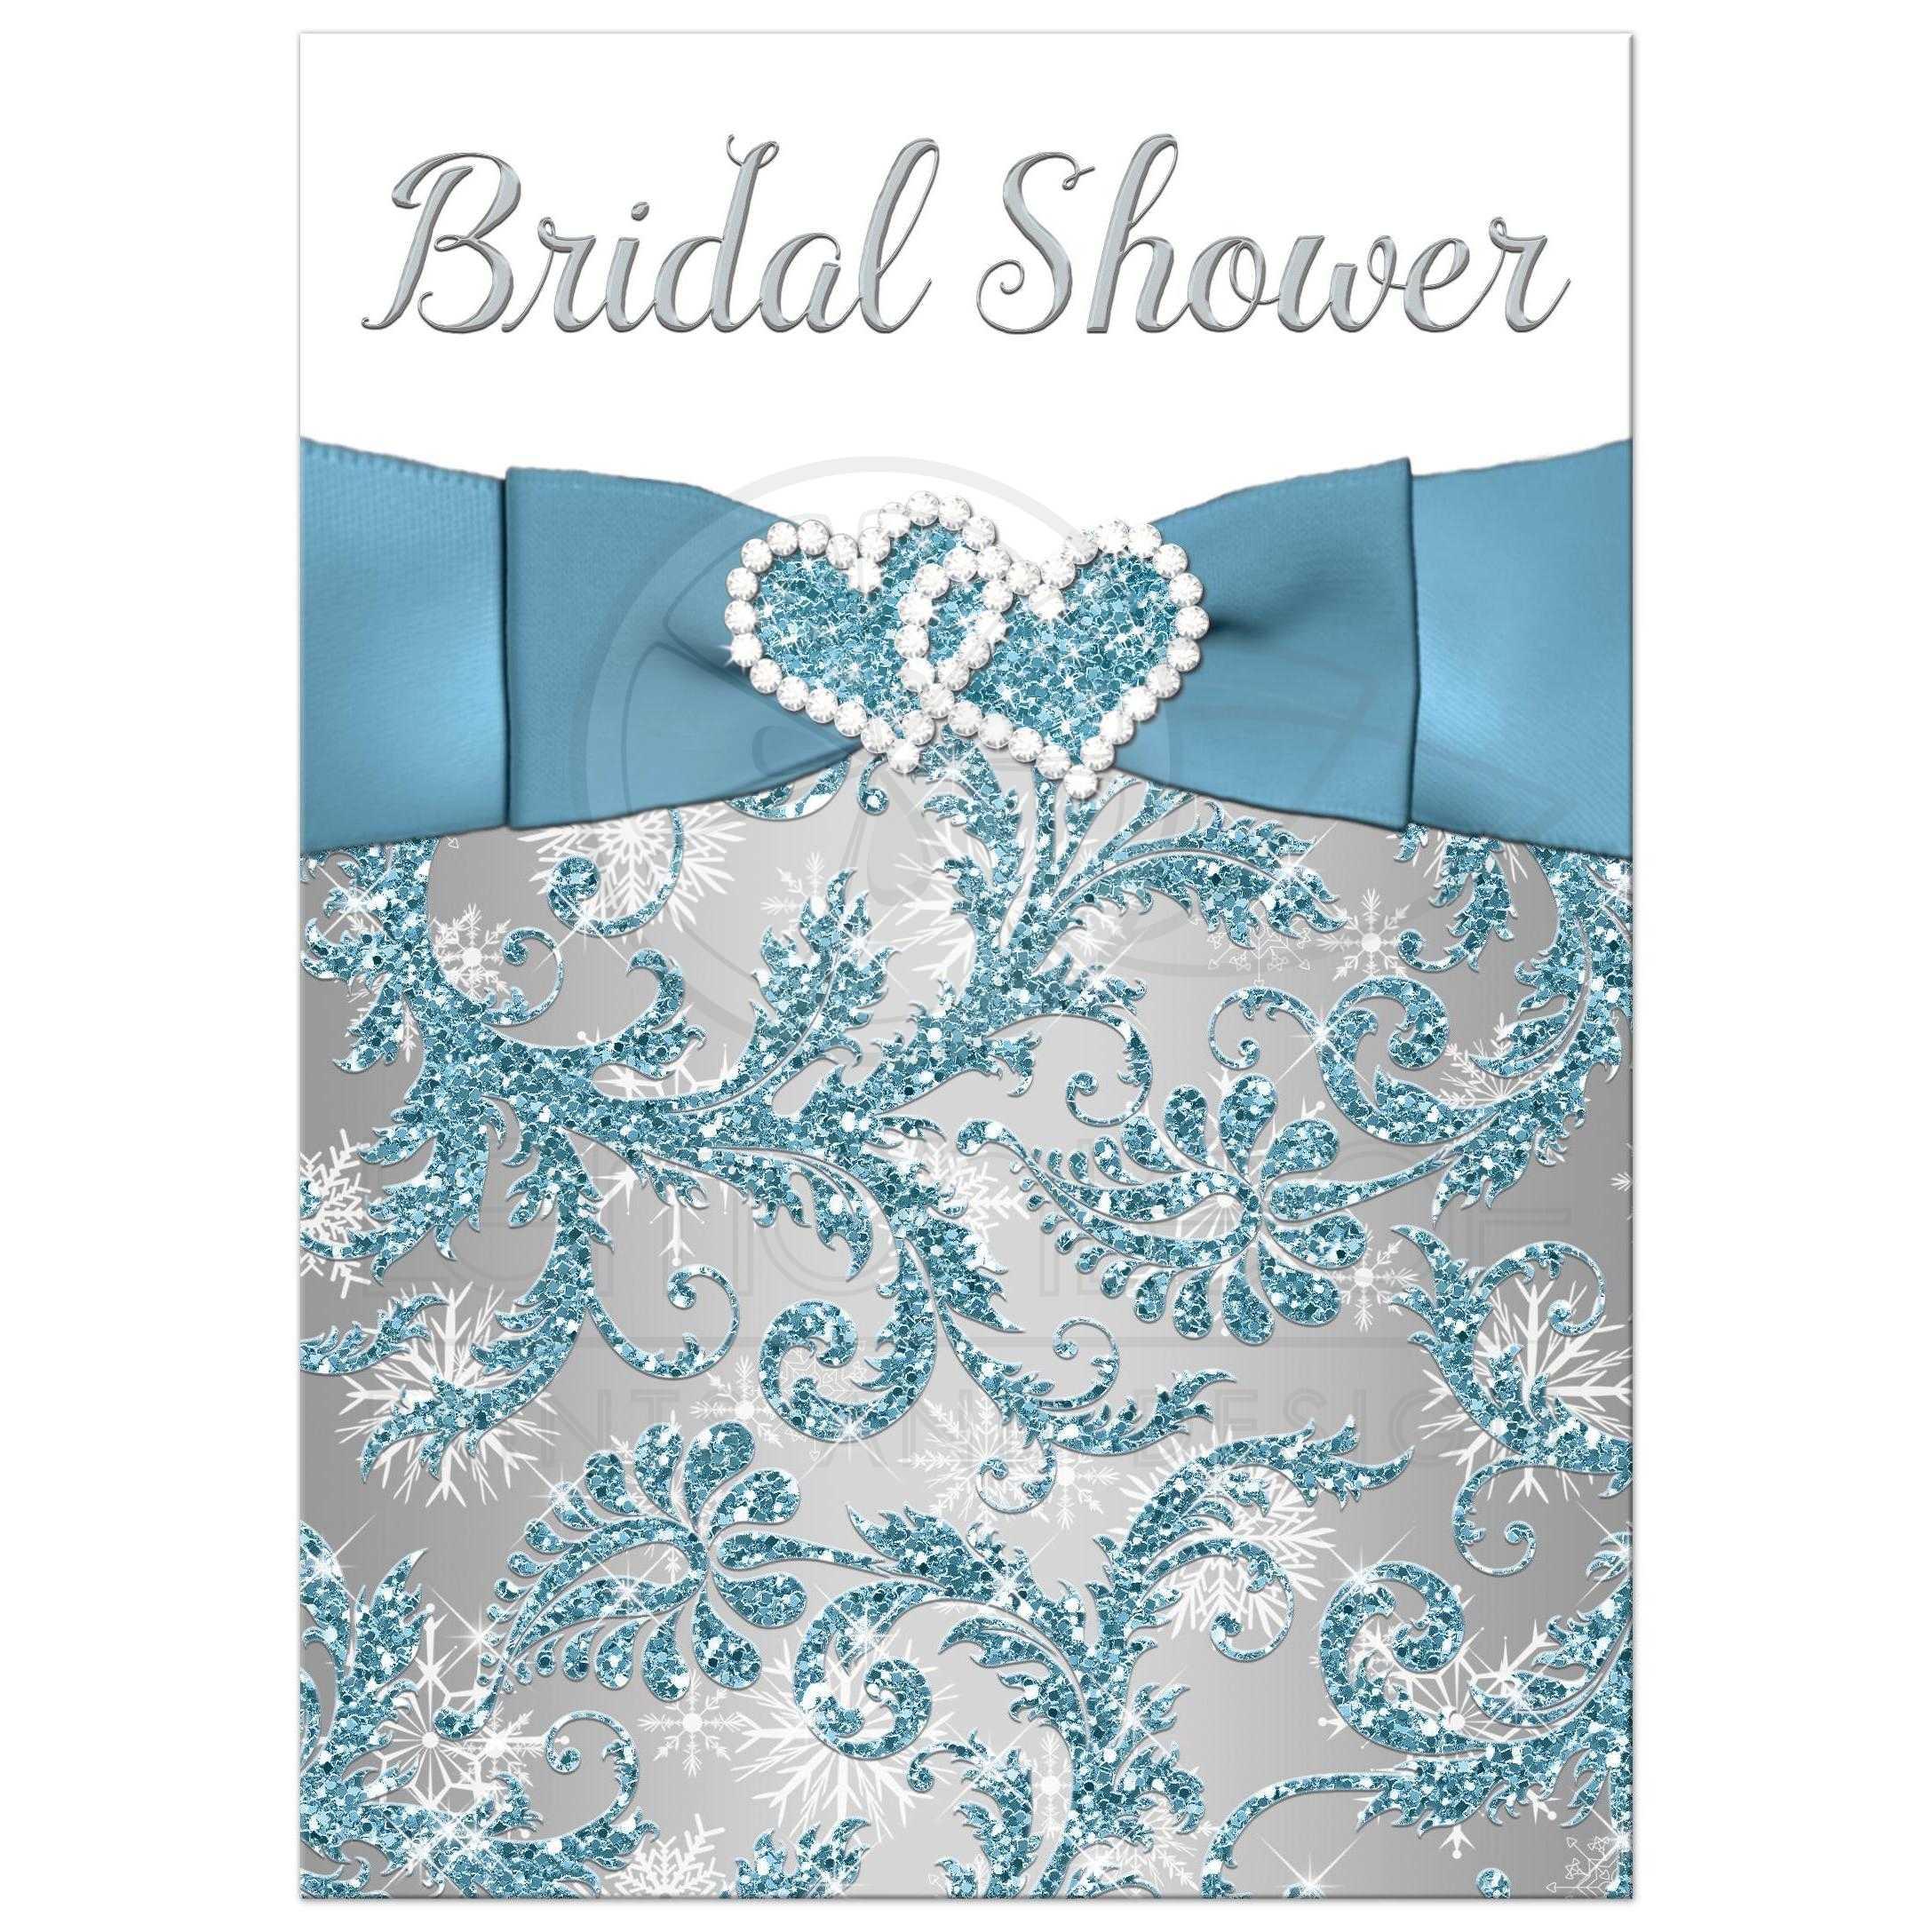 Bridal Shower Invitation | Winter Wonderland | Ice Blue, Silver ...